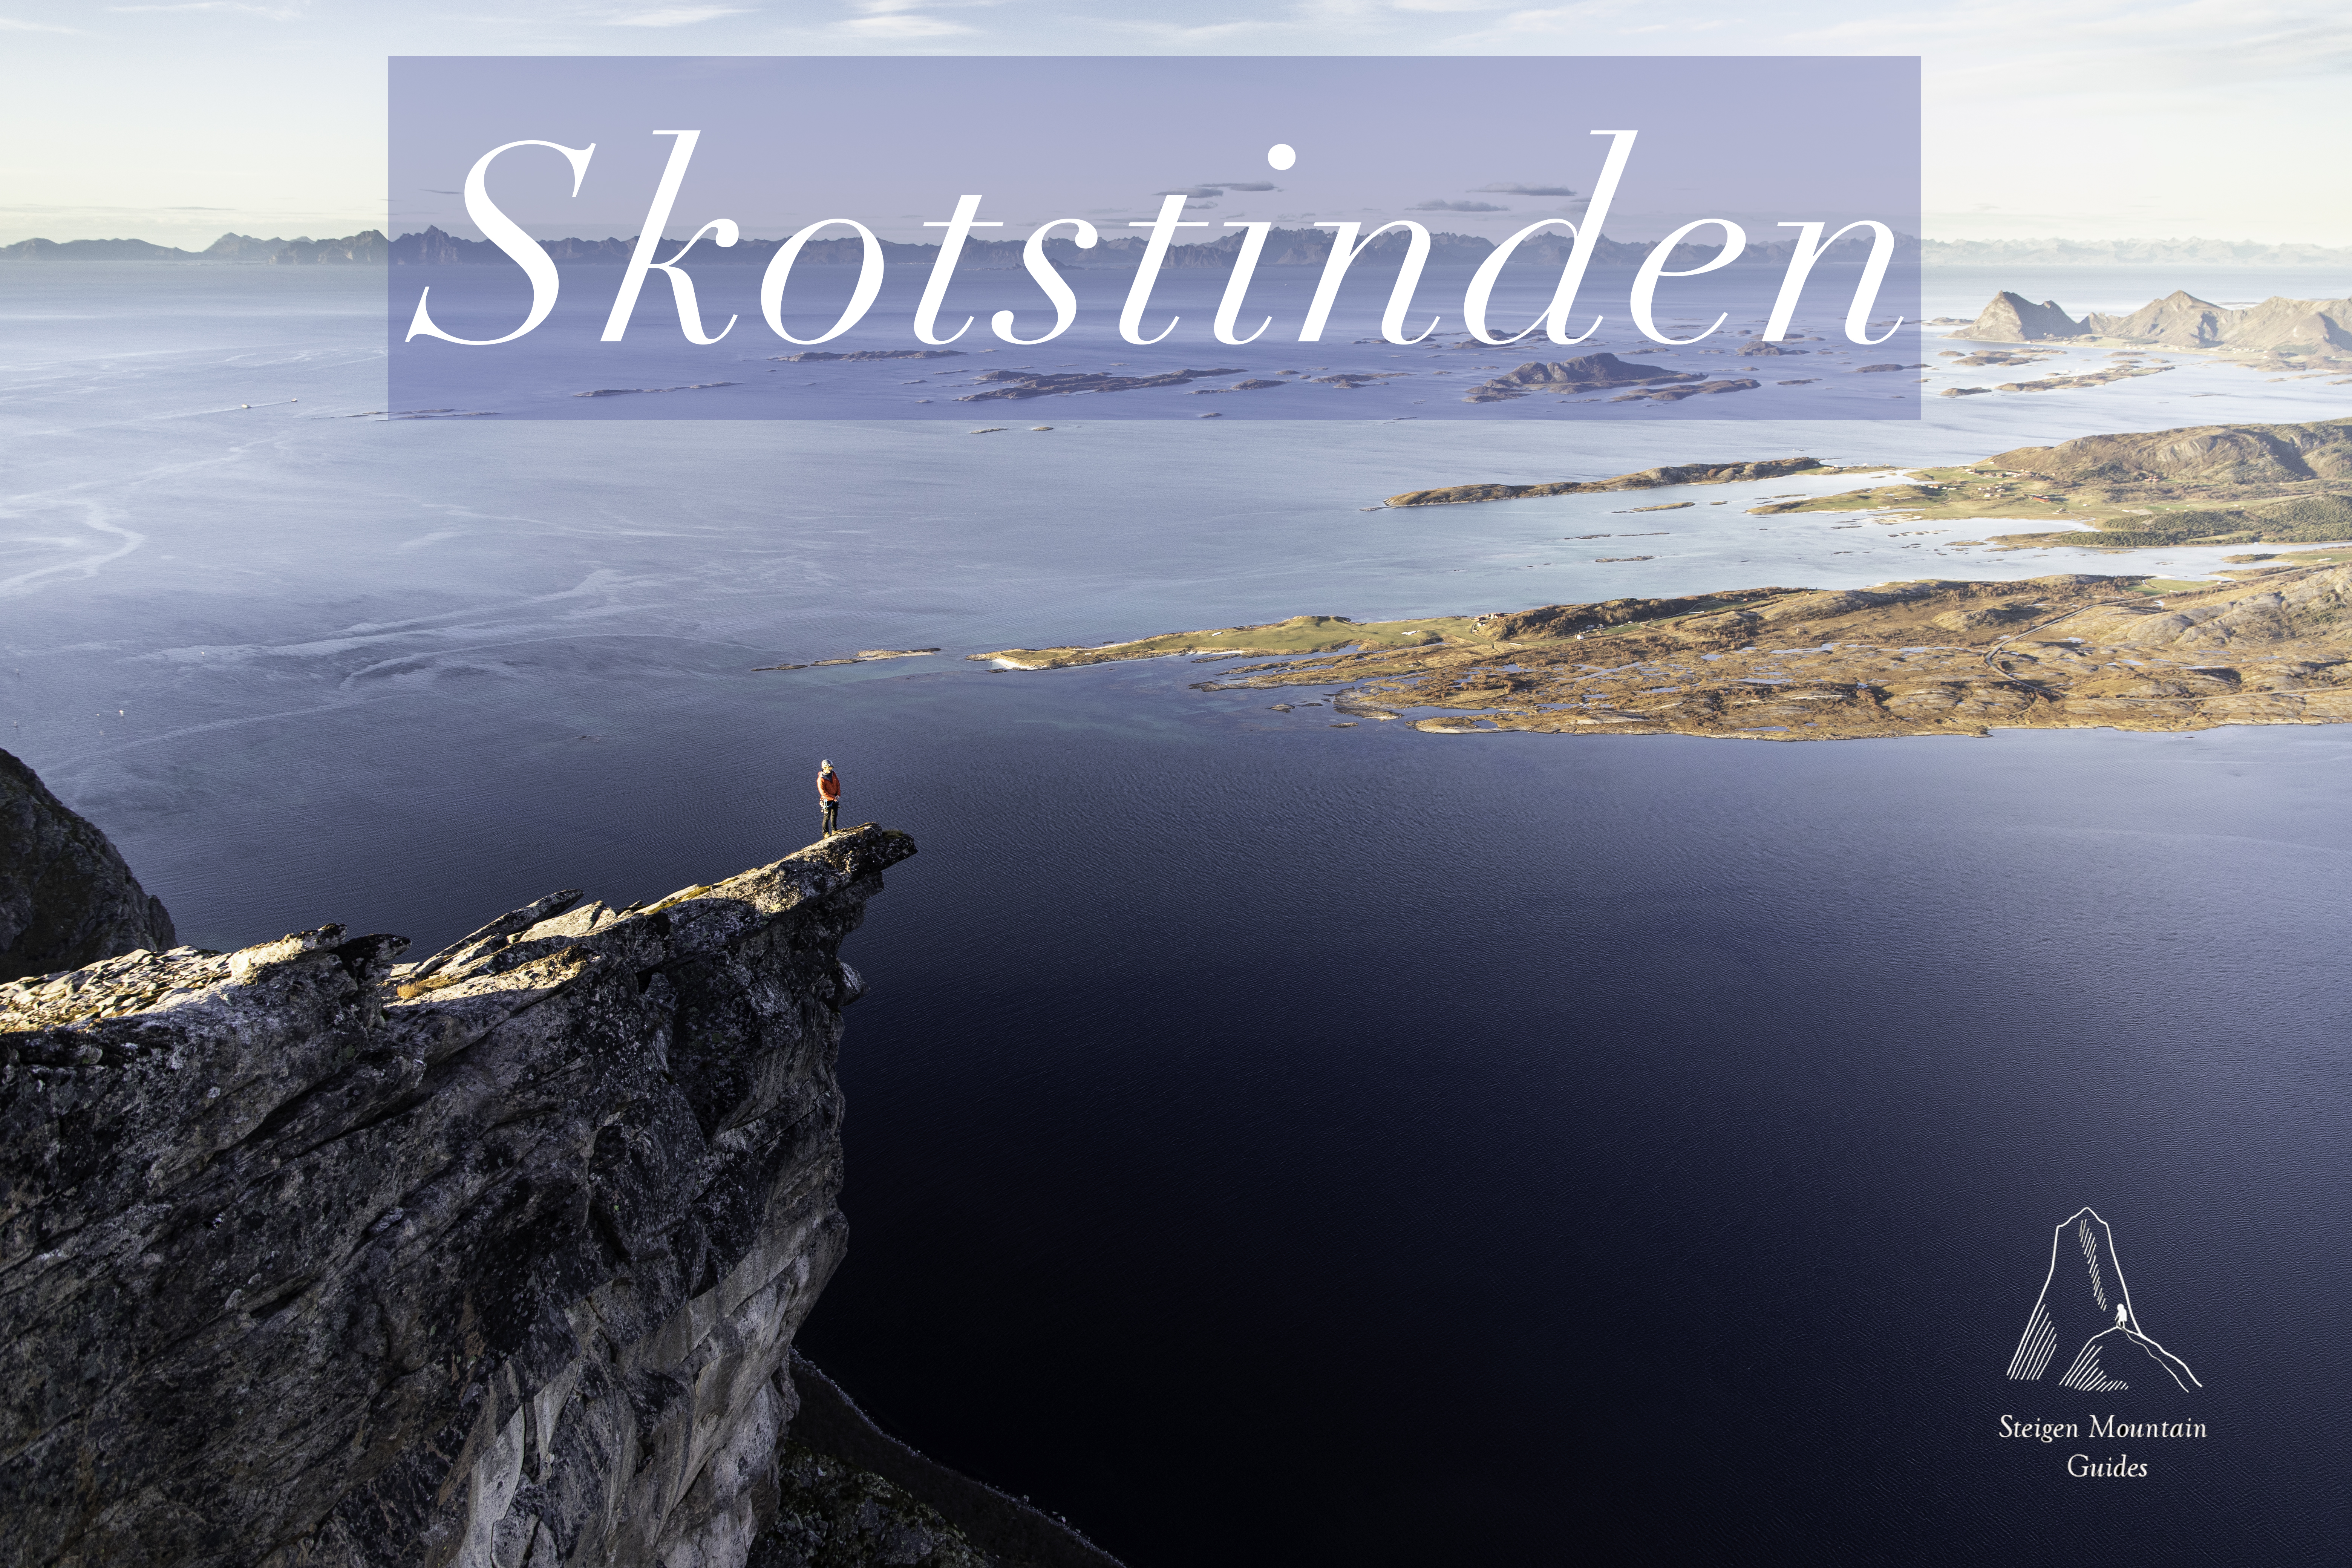 Nordskot, Steigen, Nordland,  Nordskottraversen, Nordskot-traversen, travers, fjell, fjelltur, klatring, klatre, klatretur, fjellklatring, klatrekurs, kurs, guide, guidet, Sørskot, Sørskot-tinden, Guiding, føring, fjellføring, tind, norgesferie, reisemål, Norge, Nord-Norge, Nord, Norway, Noreg, North-Norway, Naustholmen, Manshausen, Lofoten, Nordland, Stetind, Geita, Svolværgeita, Salten, Bodø, Strandåtind, Kjerringøy, Ørnenebbet, Skotstind, Skotstindan, Tur, bilder, turbilder, Steigen Mountain guides, Vennetur, friluftsliv, historie, geografi.